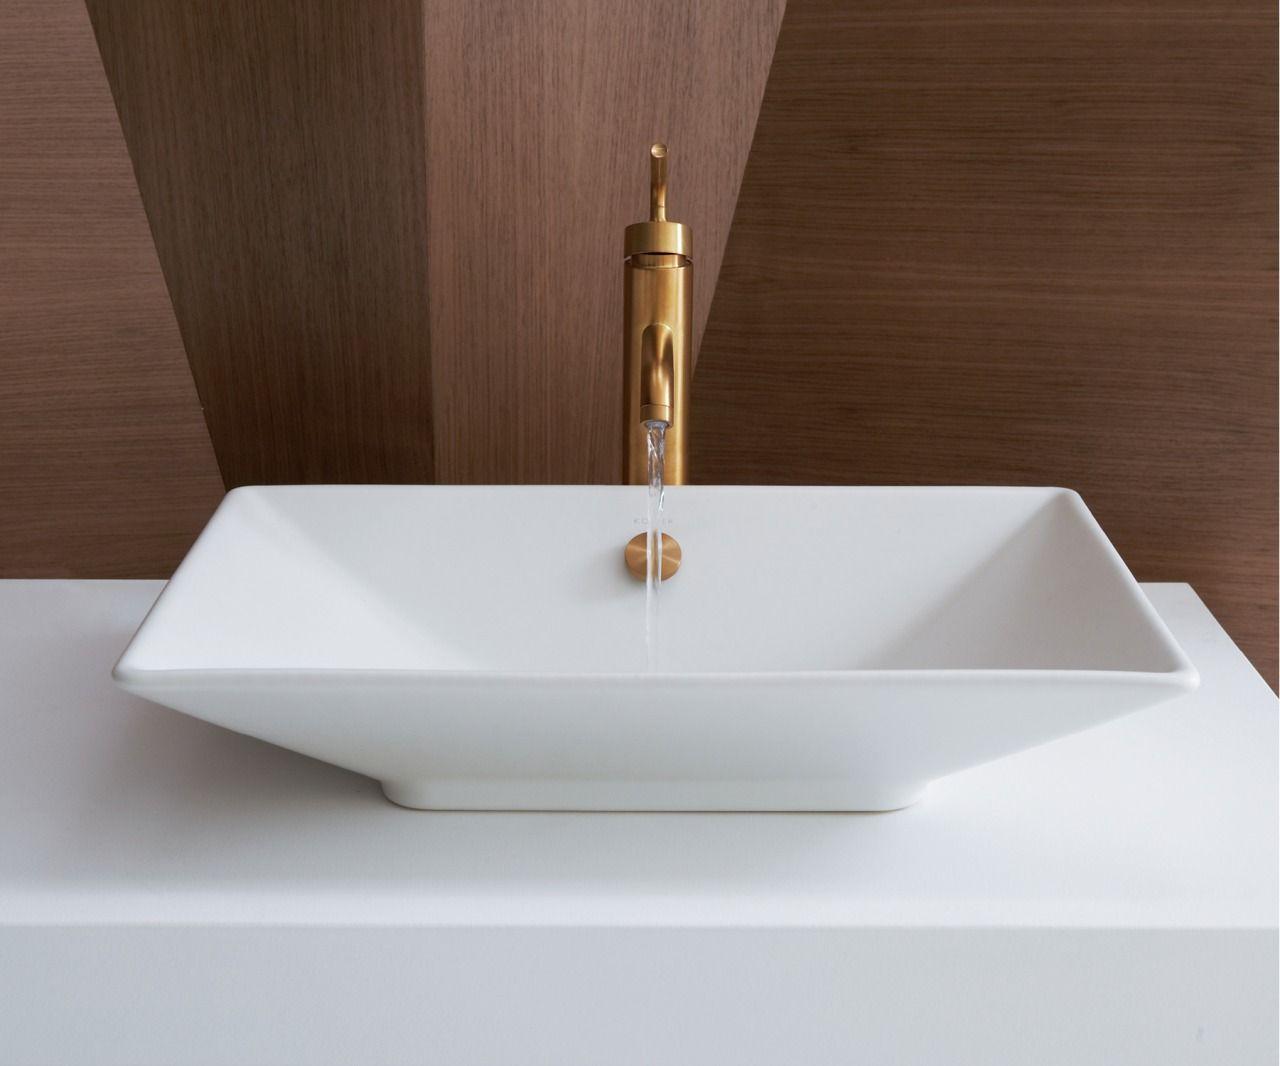 bold Ideas from Kohler | bathe | Pinterest | Sinks, Faucet and ...